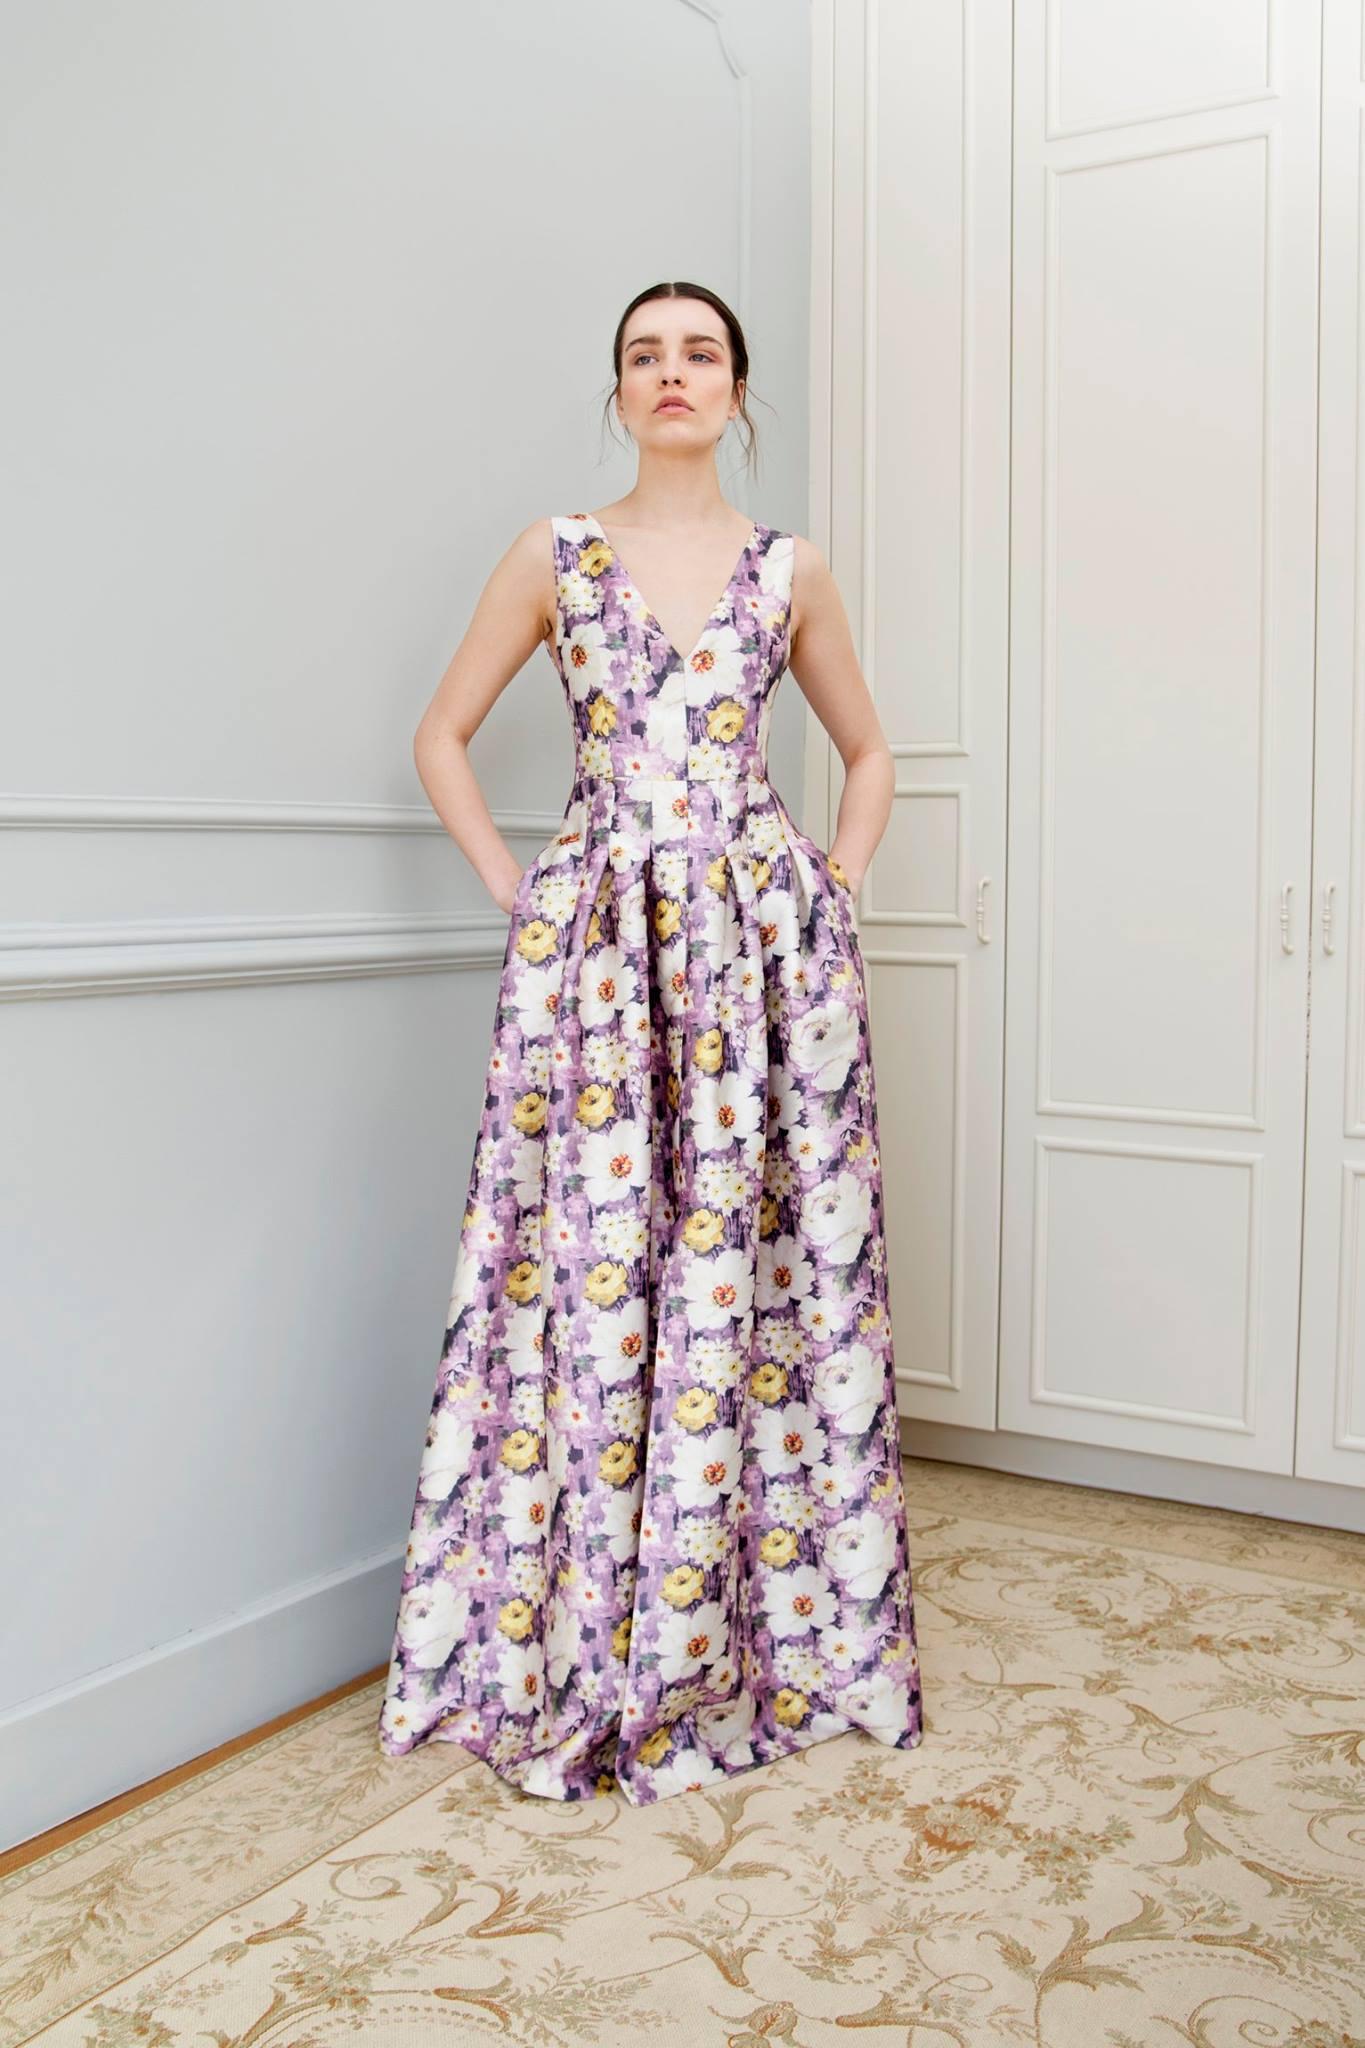 168530e5c7ec Βρήκαμε τα ωραιότερα φορέματα για όσες γίνονται κουμπάρες αυτό το καλοκαίρι  - Μόδα